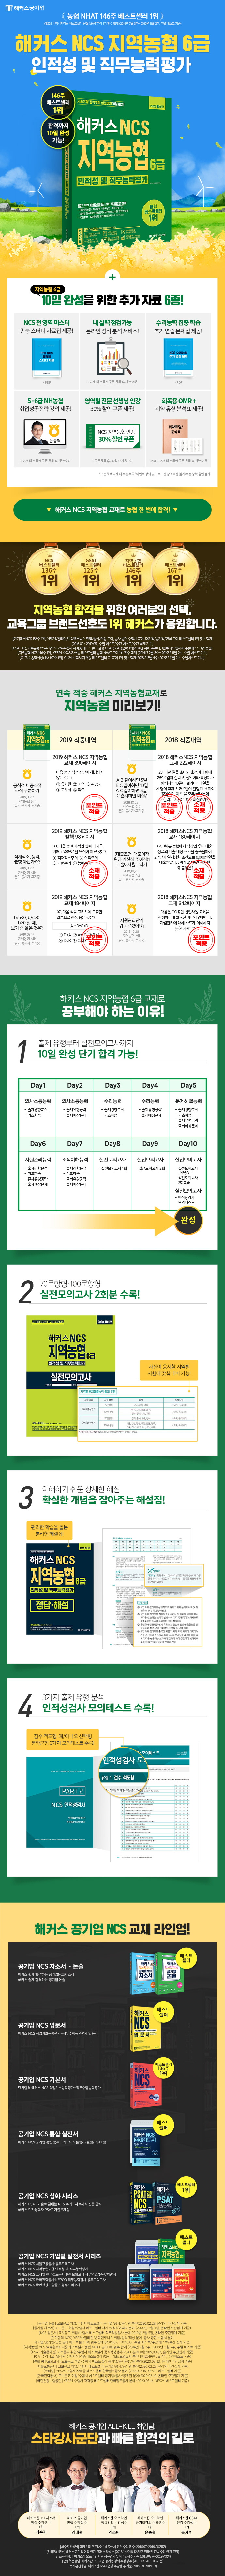 NCS 지역농협 6급 인적성 및 직무능력평가(해커스) 도서 상세이미지